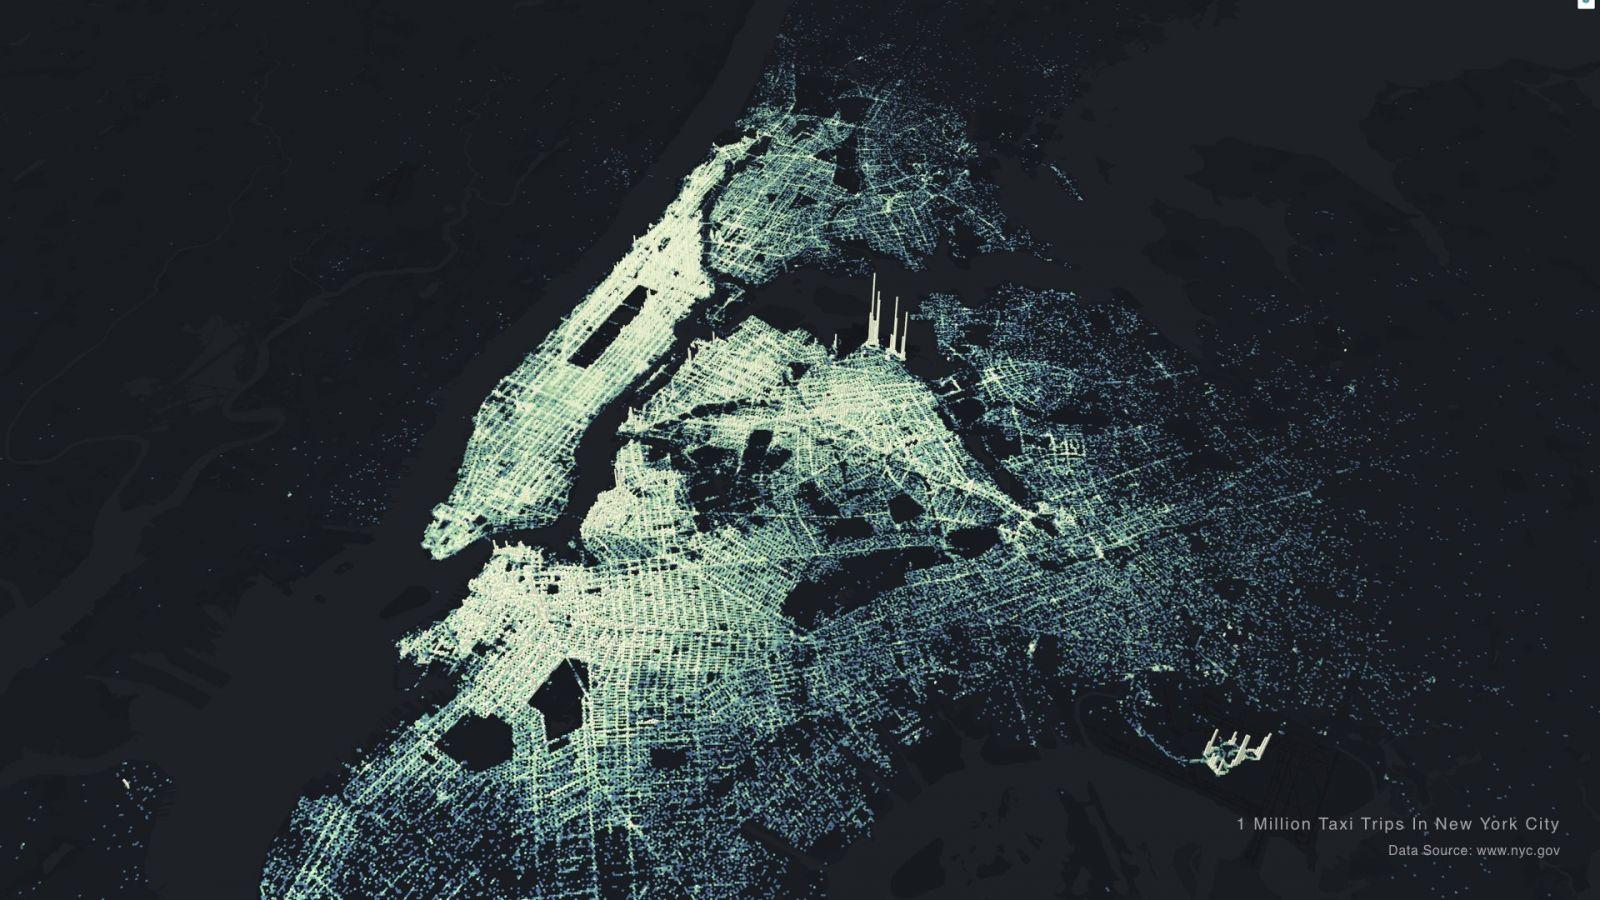 Uber開源地理資訊視覺化工具kepler gl,連Airbnb和Google都愛用